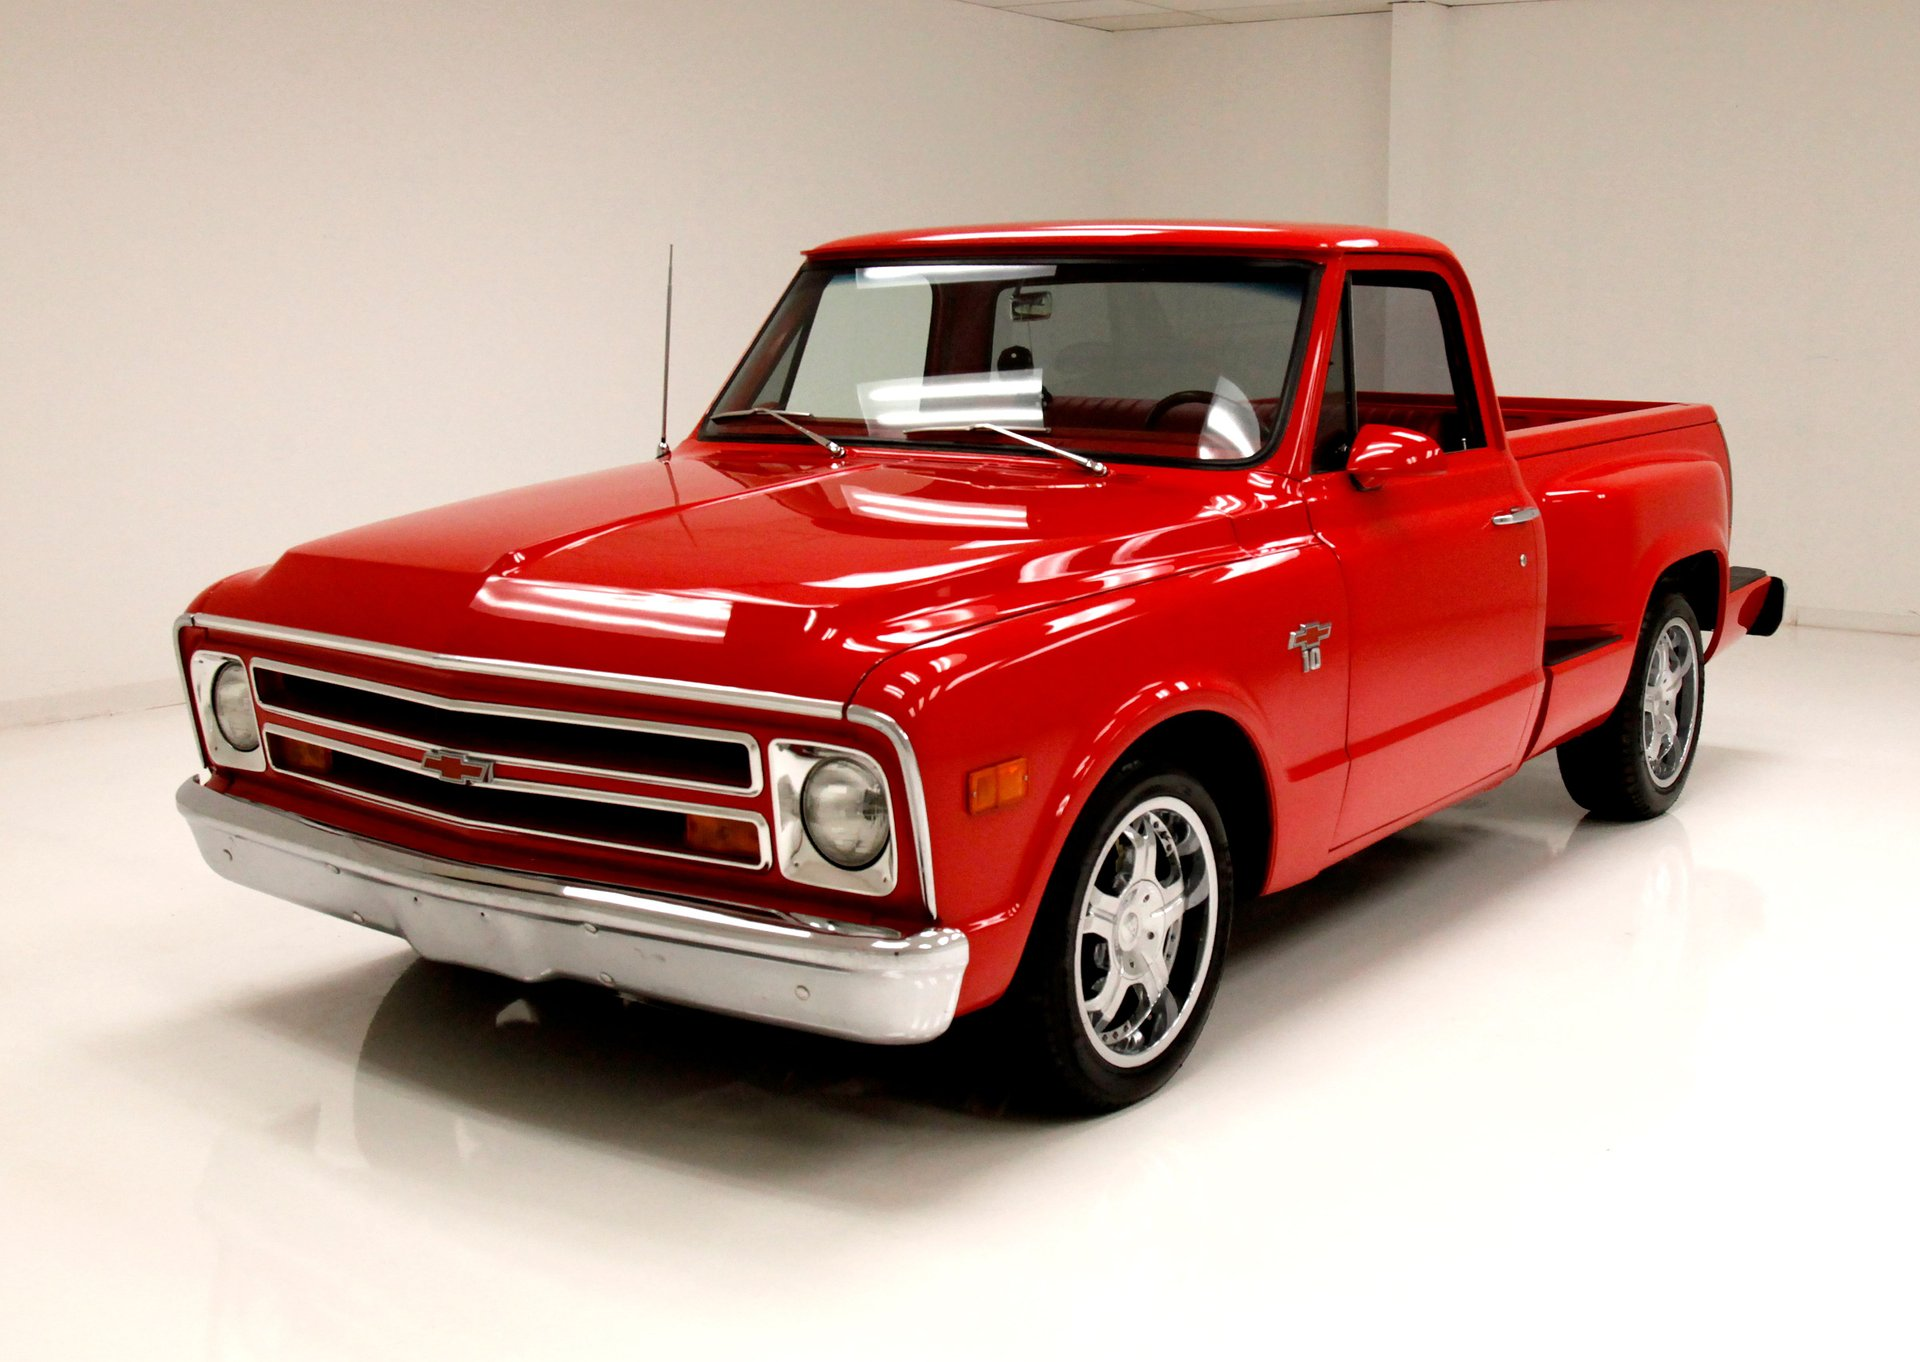 1968 Chevrolet Pickup